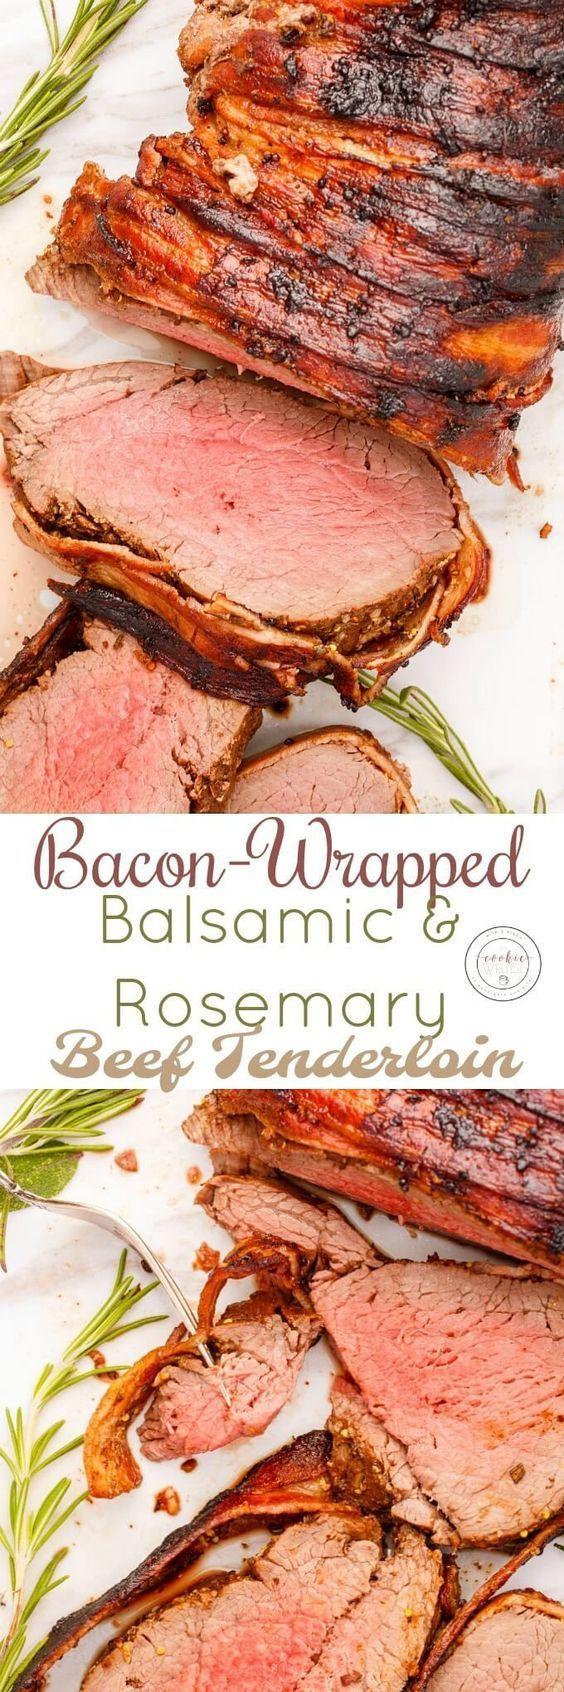 Balsamic and rosemary beef tenderloin recipe beef tenderloin bacon wrapped balsamic and rosemary beef tenderloin the cookie writer ccuart Choice Image